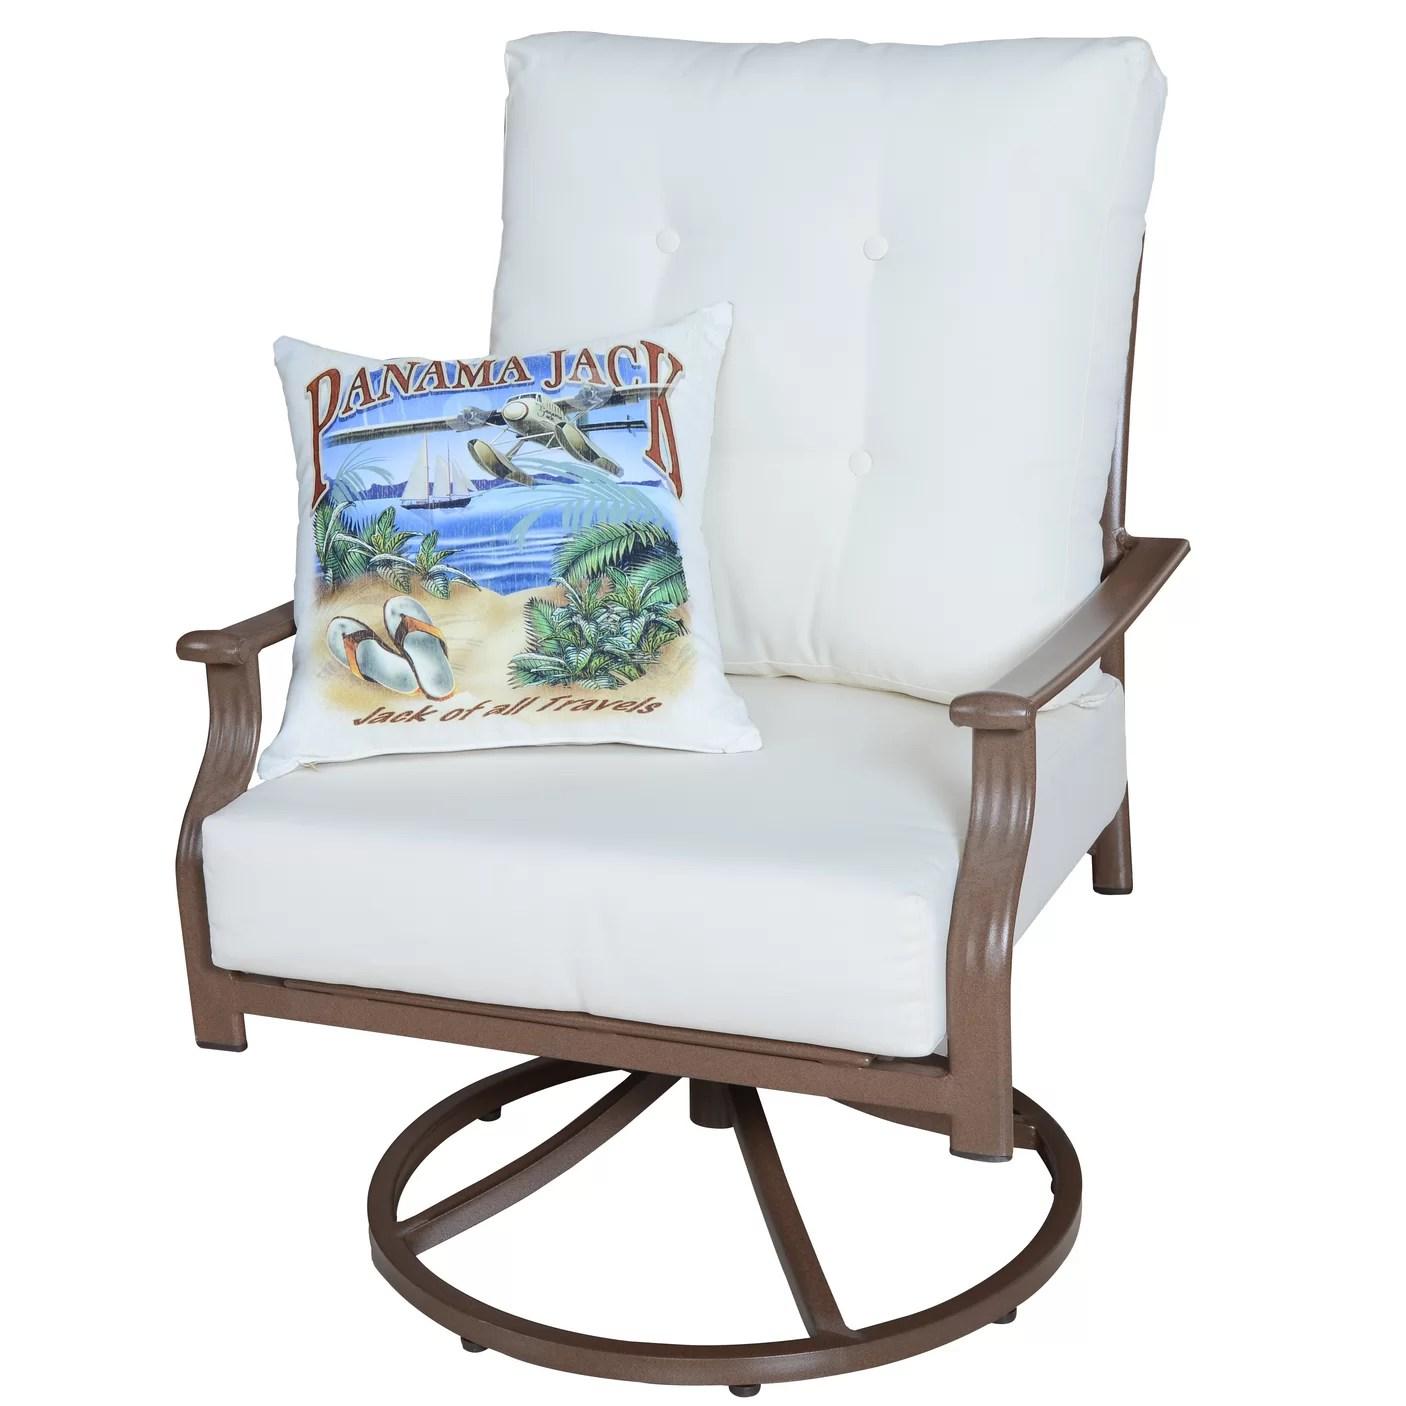 swivel chair cushions traditional chinese medicine chairman mao panama jack island breeze with